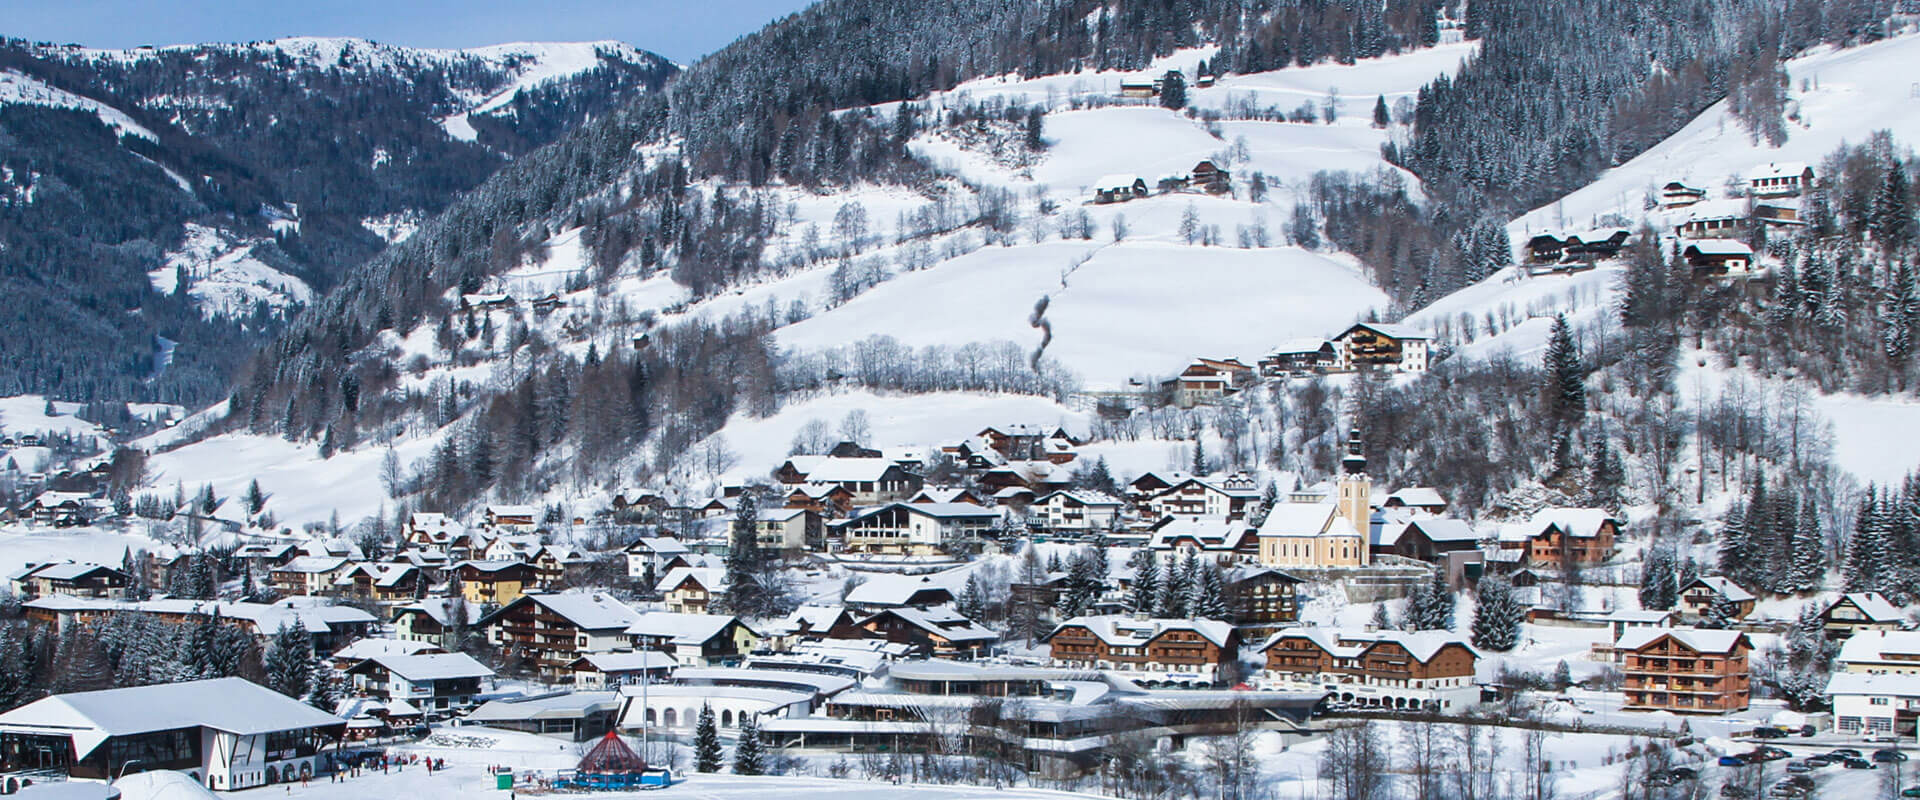 Bad Kirchheim bad kleinkirchheim hervisrent at